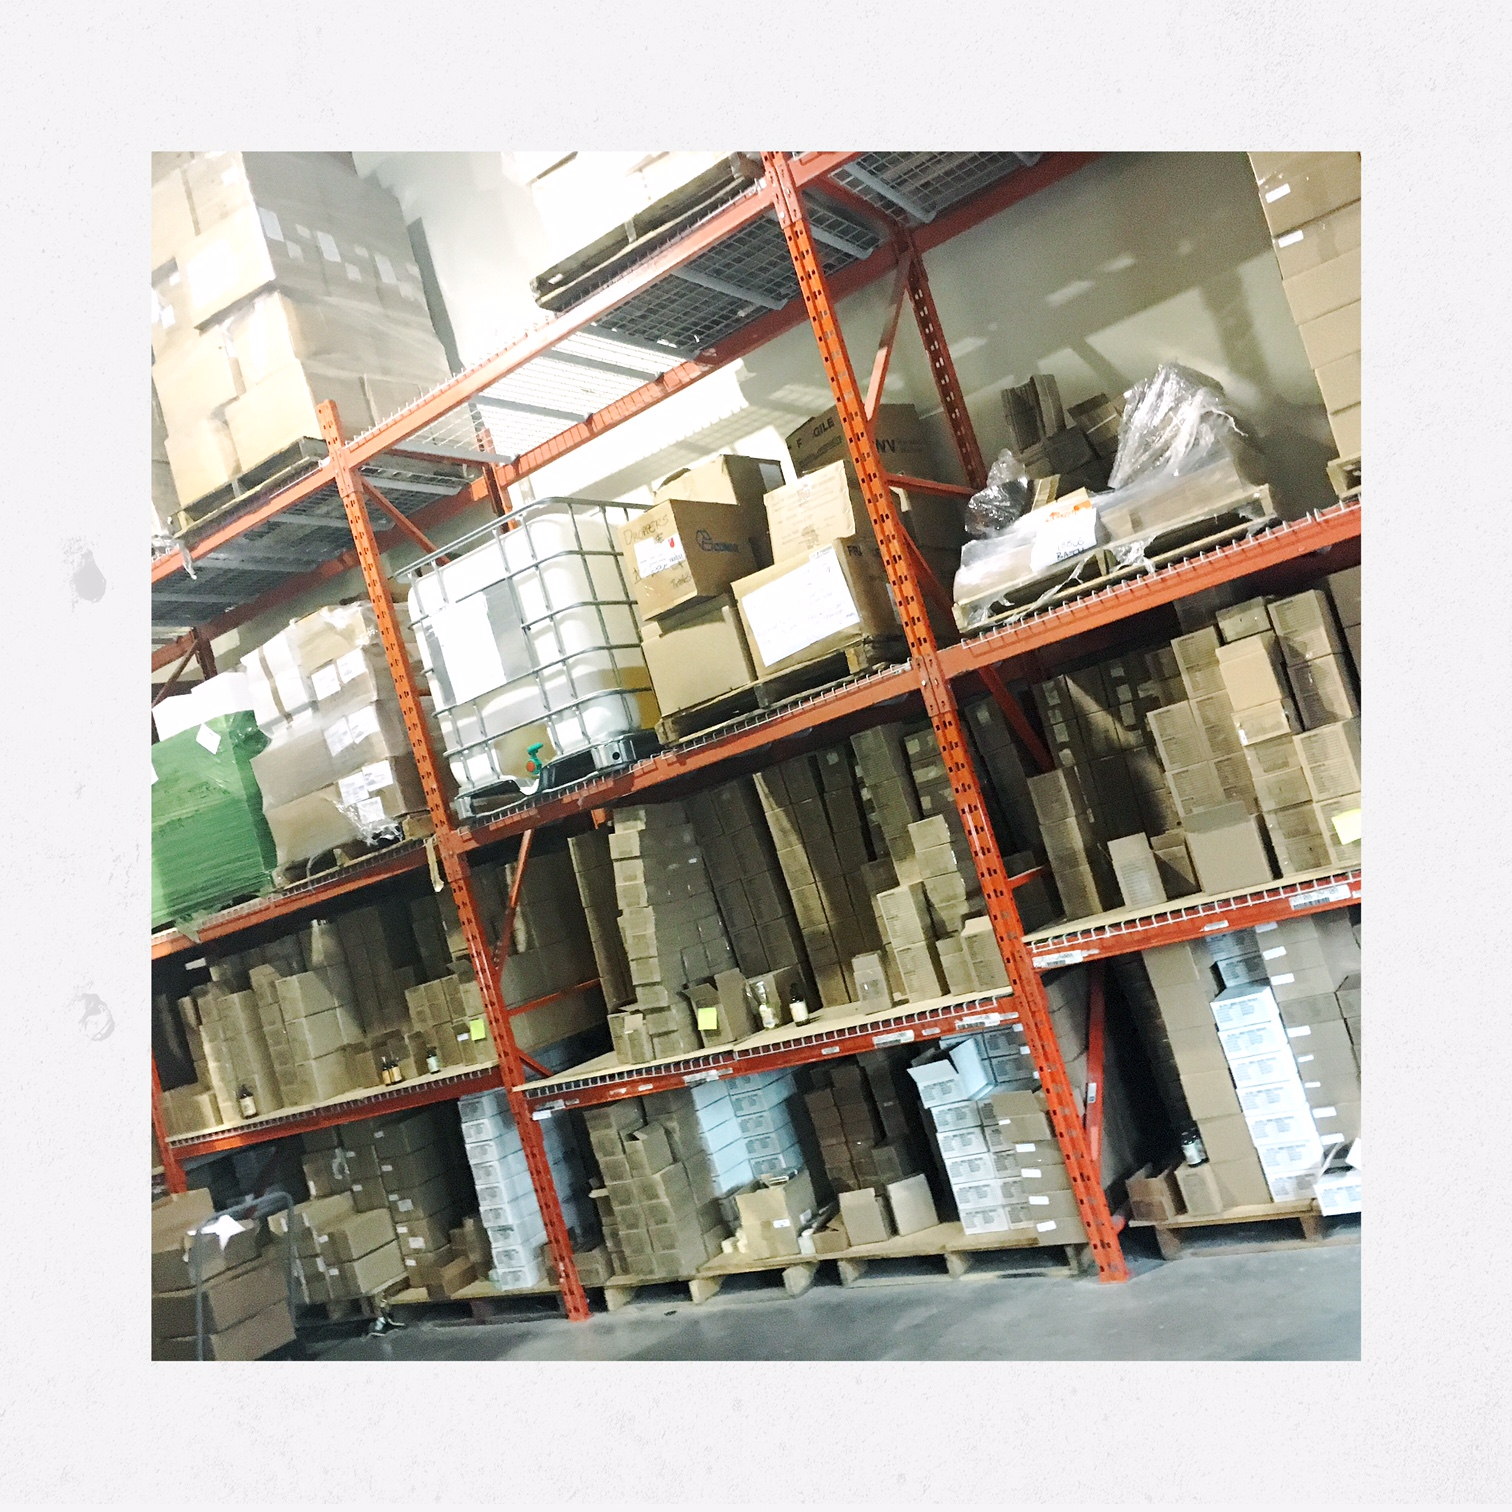 factory shelves full of Barefoot Venus product